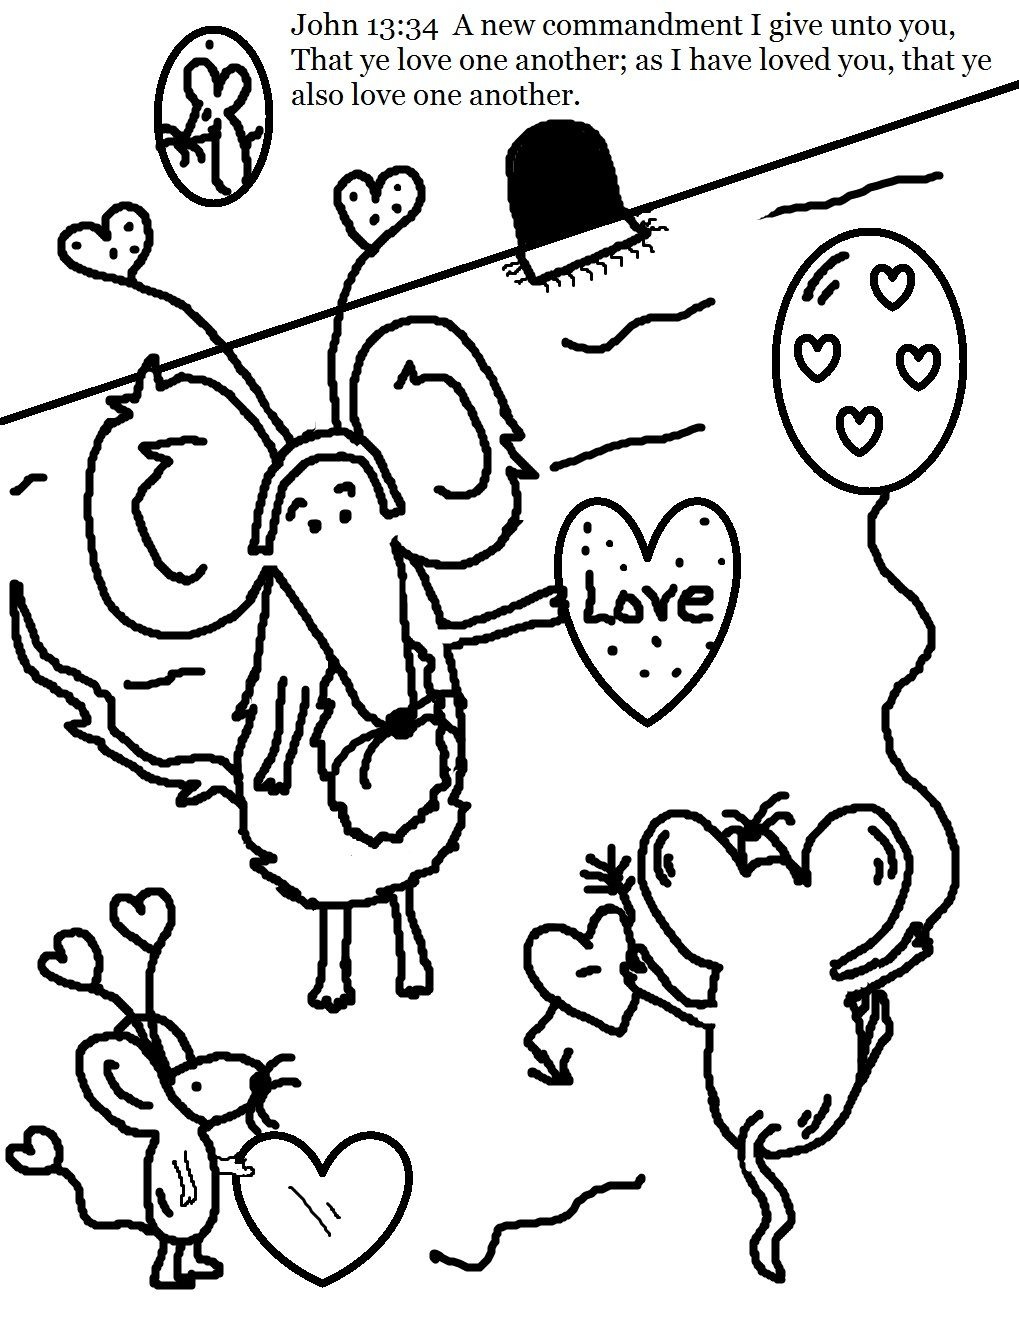 Valentine Mice John 13:34 coloring page. | Valentine\'s Day Stuff ...